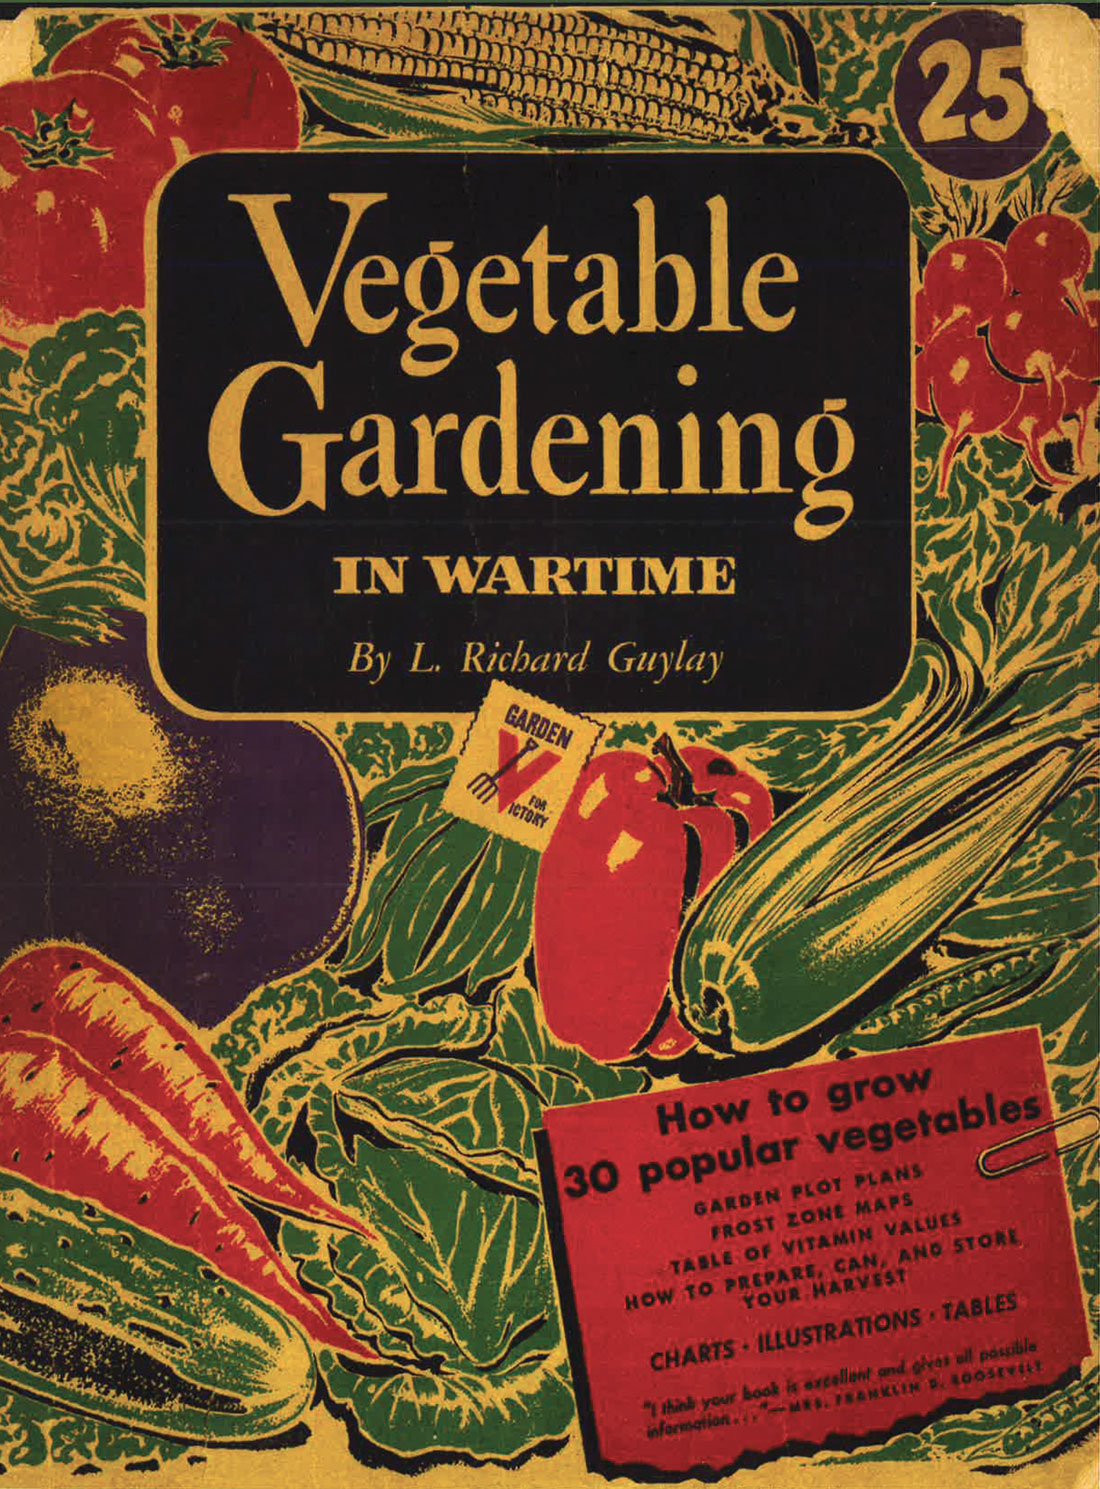 Vegetable Gardening in Wartime